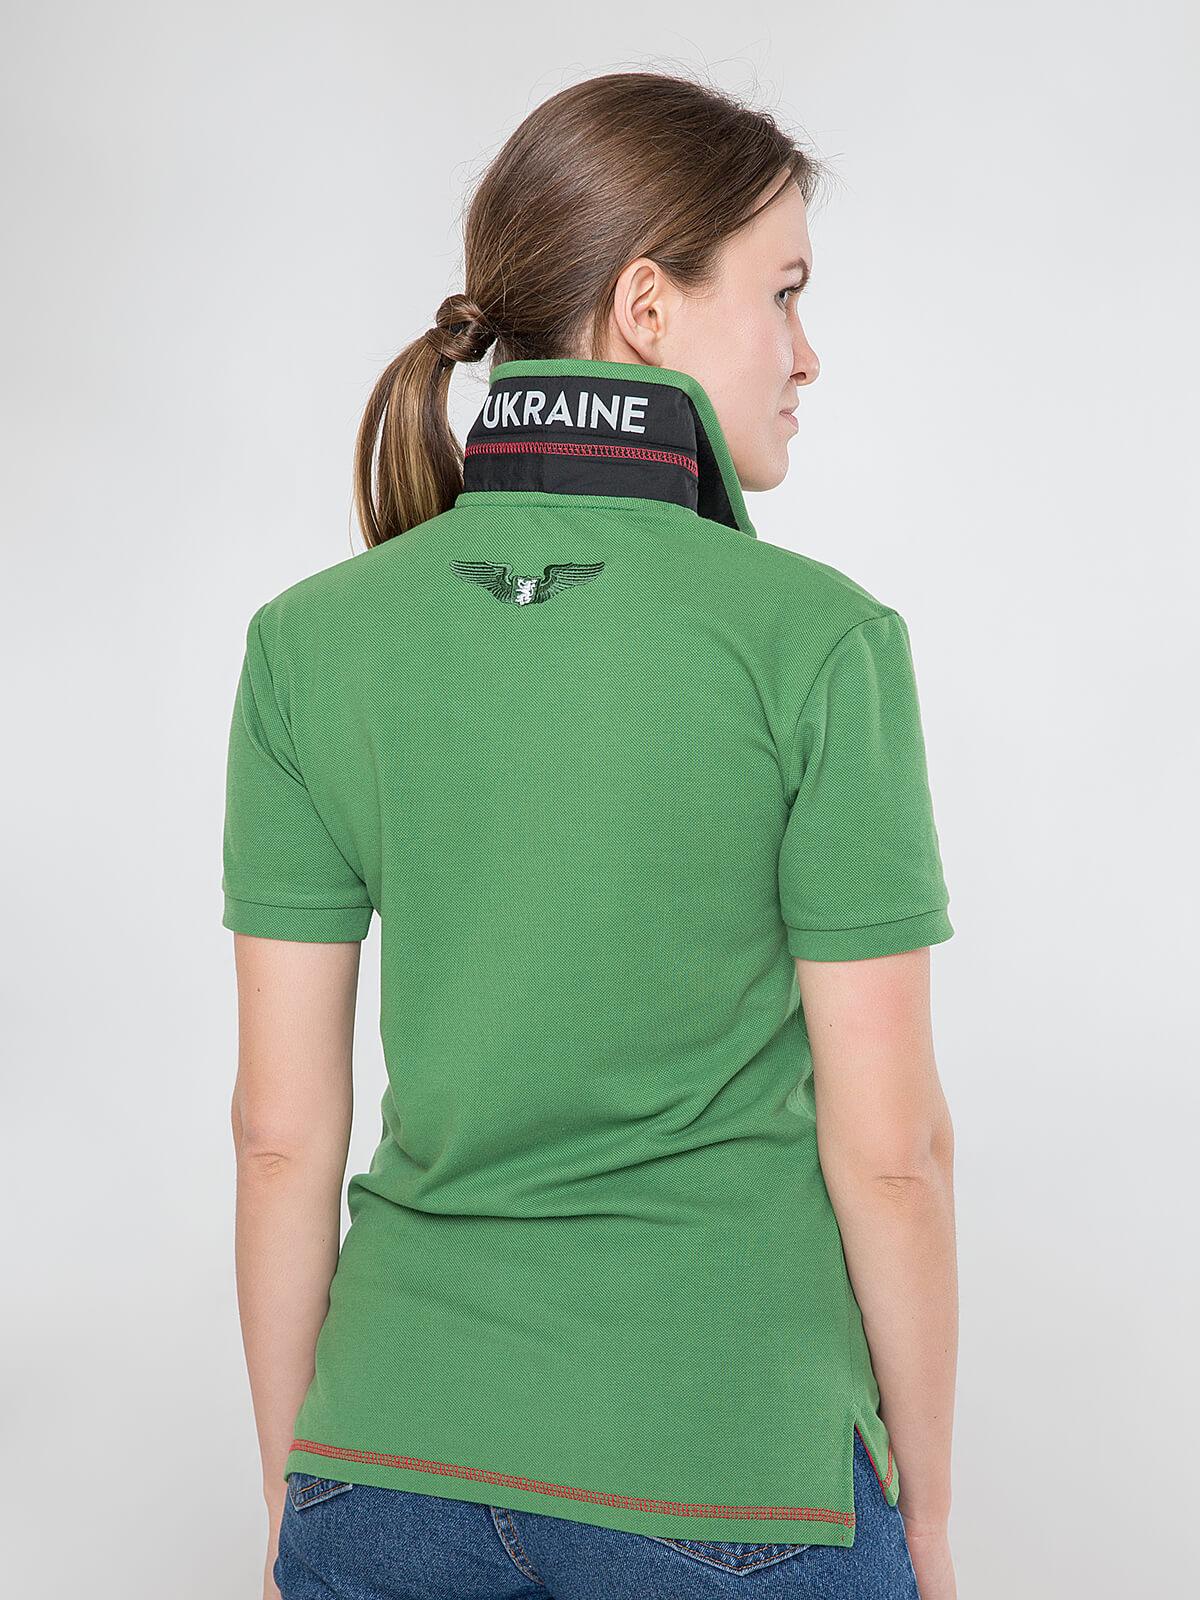 Women's Polo Shirt Wings. Color green.  Pique fabric: 100% cotton.